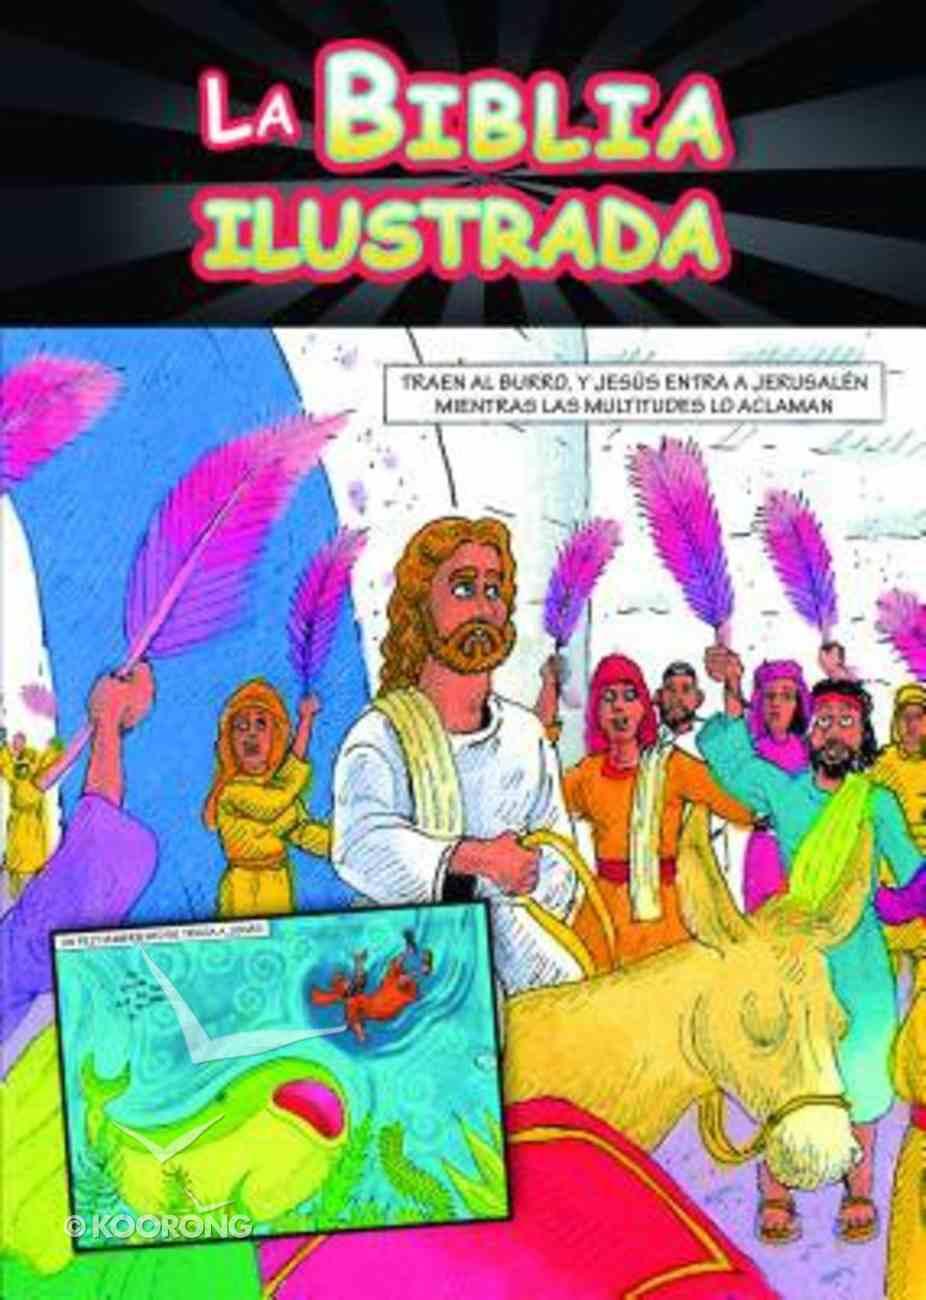 Biblia Ilustrada, La (Comic Book Bible) Paperback